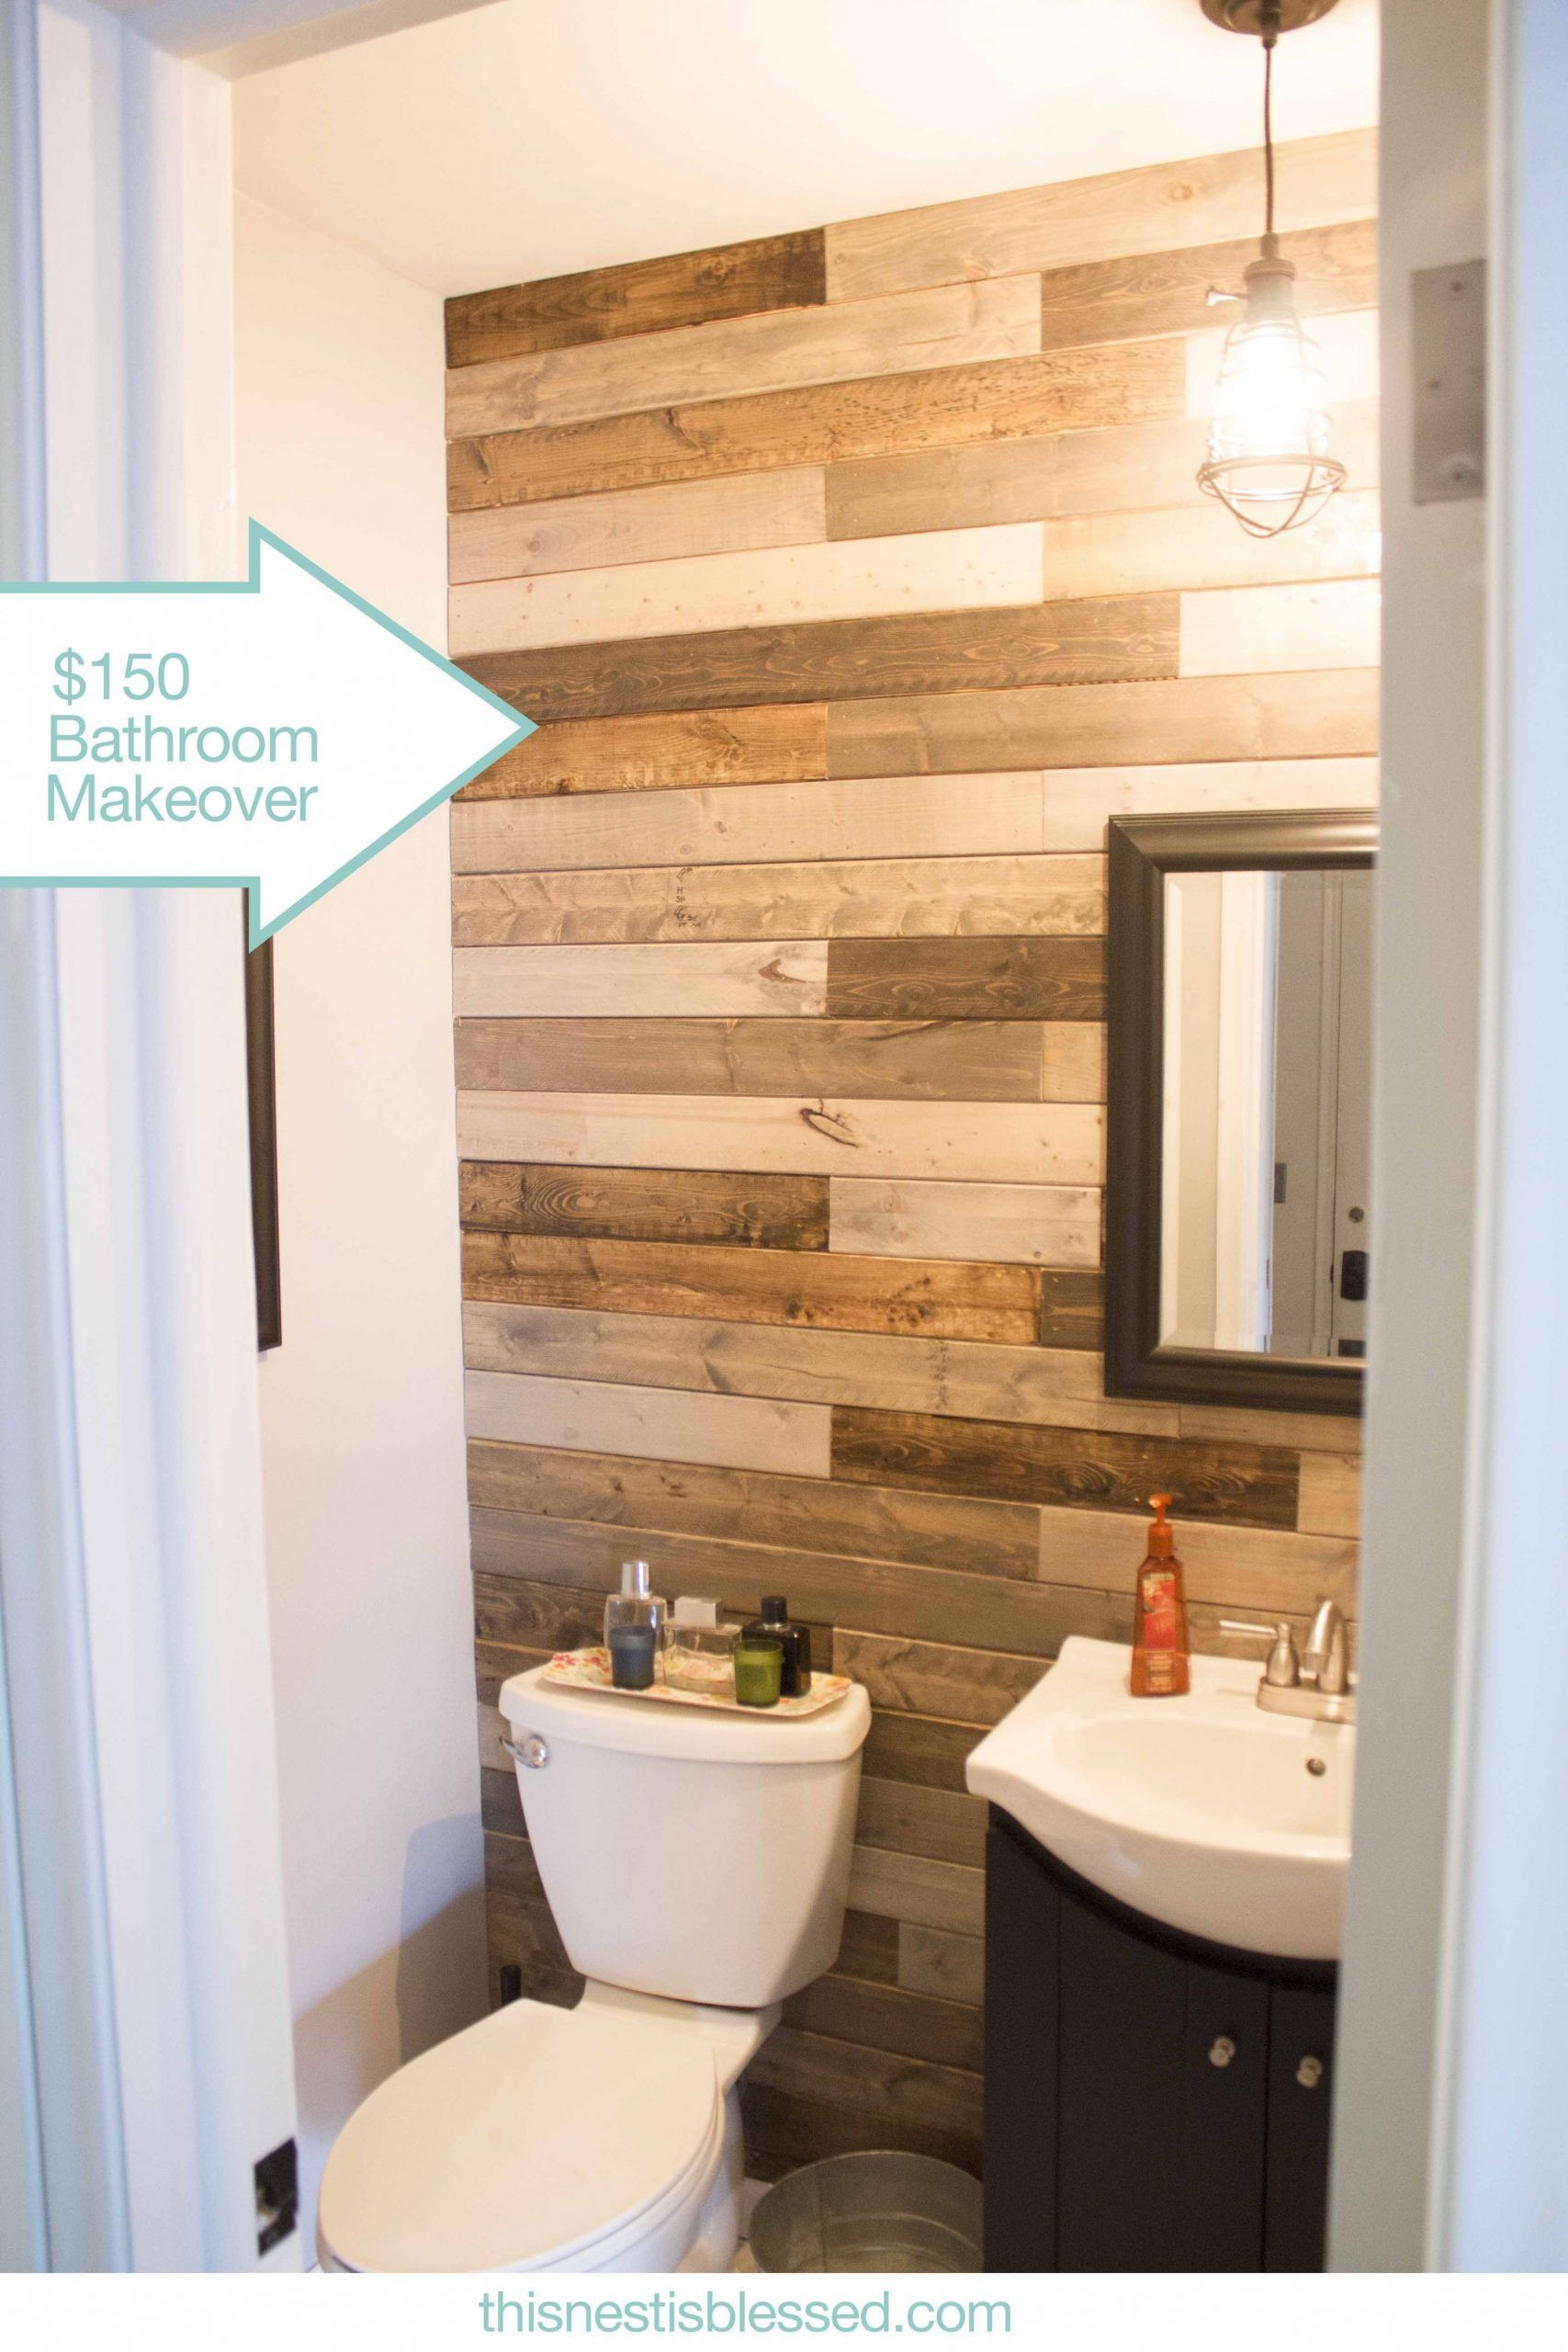 Pallet Wood Accent Wall Bathroom In 2020 Bathroom Accent Wall Plank Wall Bathroom Bathroom Makeover